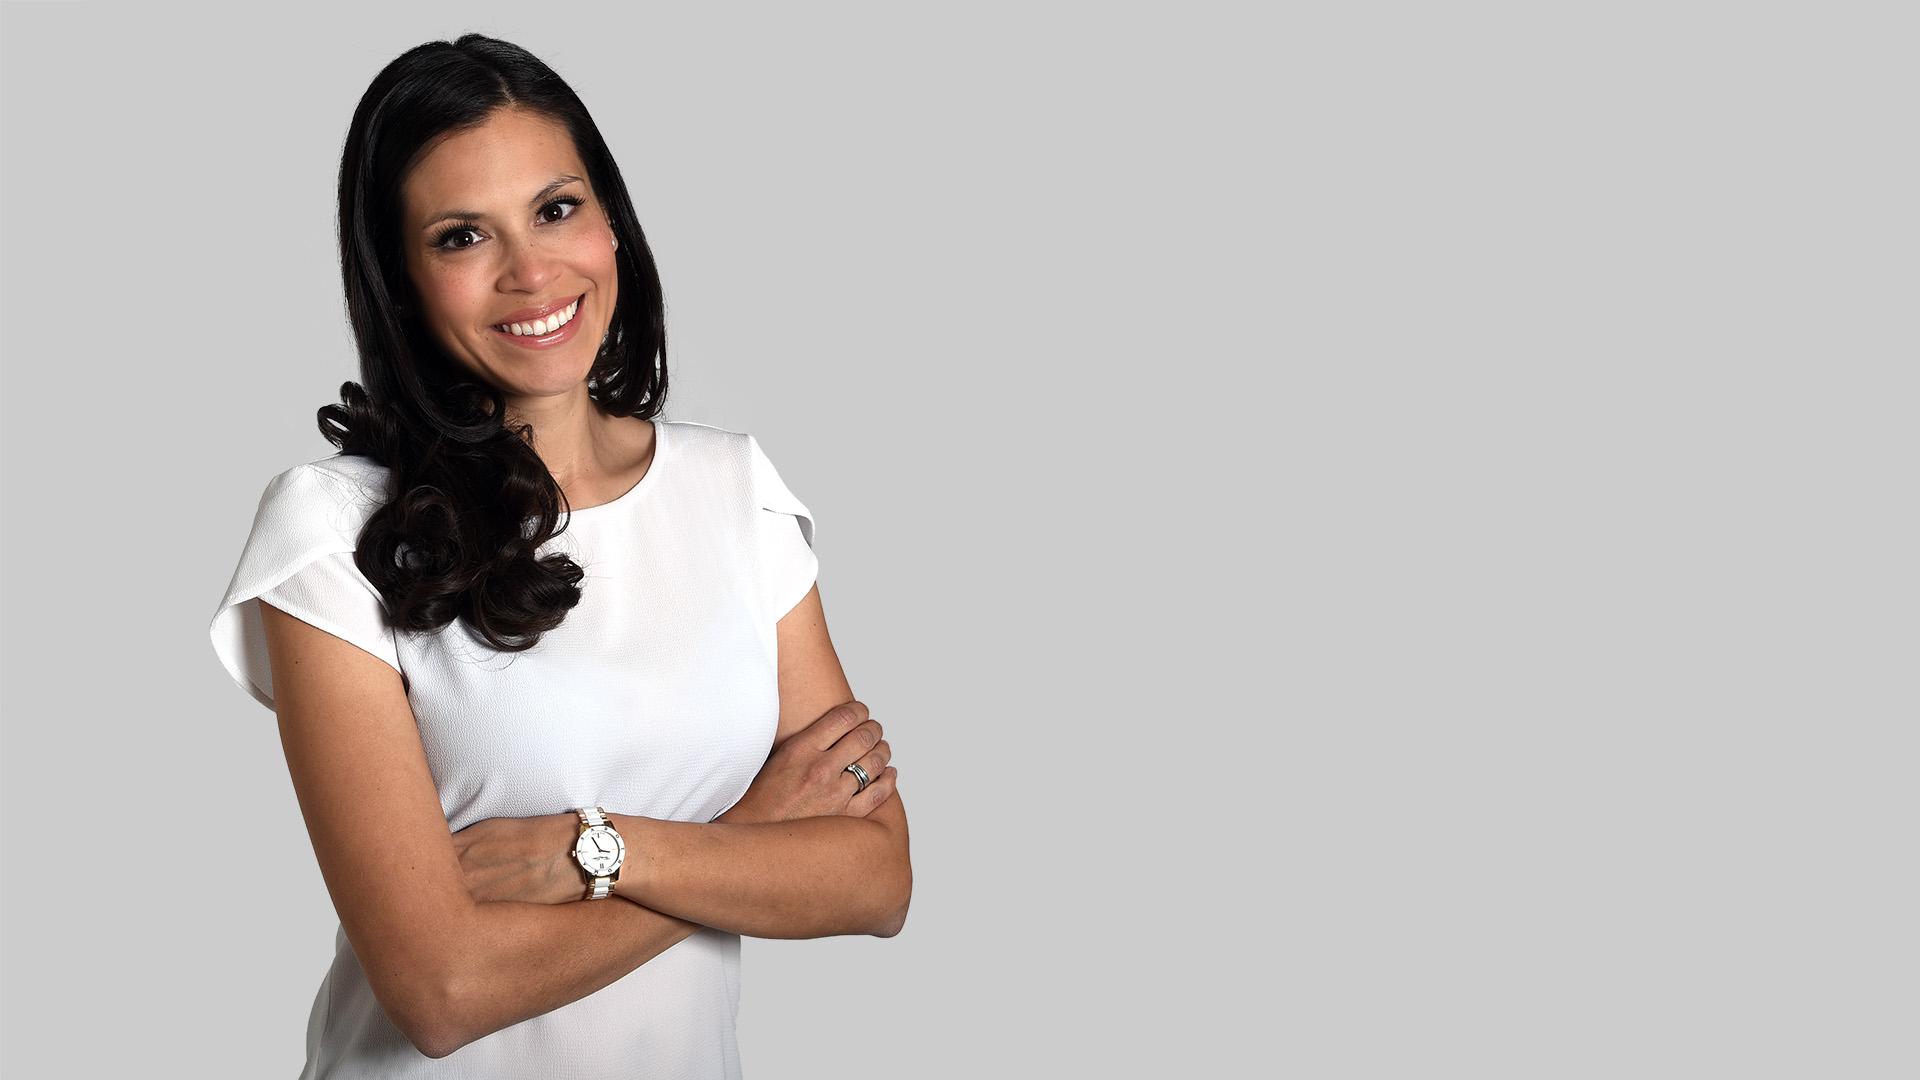 Erica Gonzalez – Cardio Medic - Kardiologie Altstetten